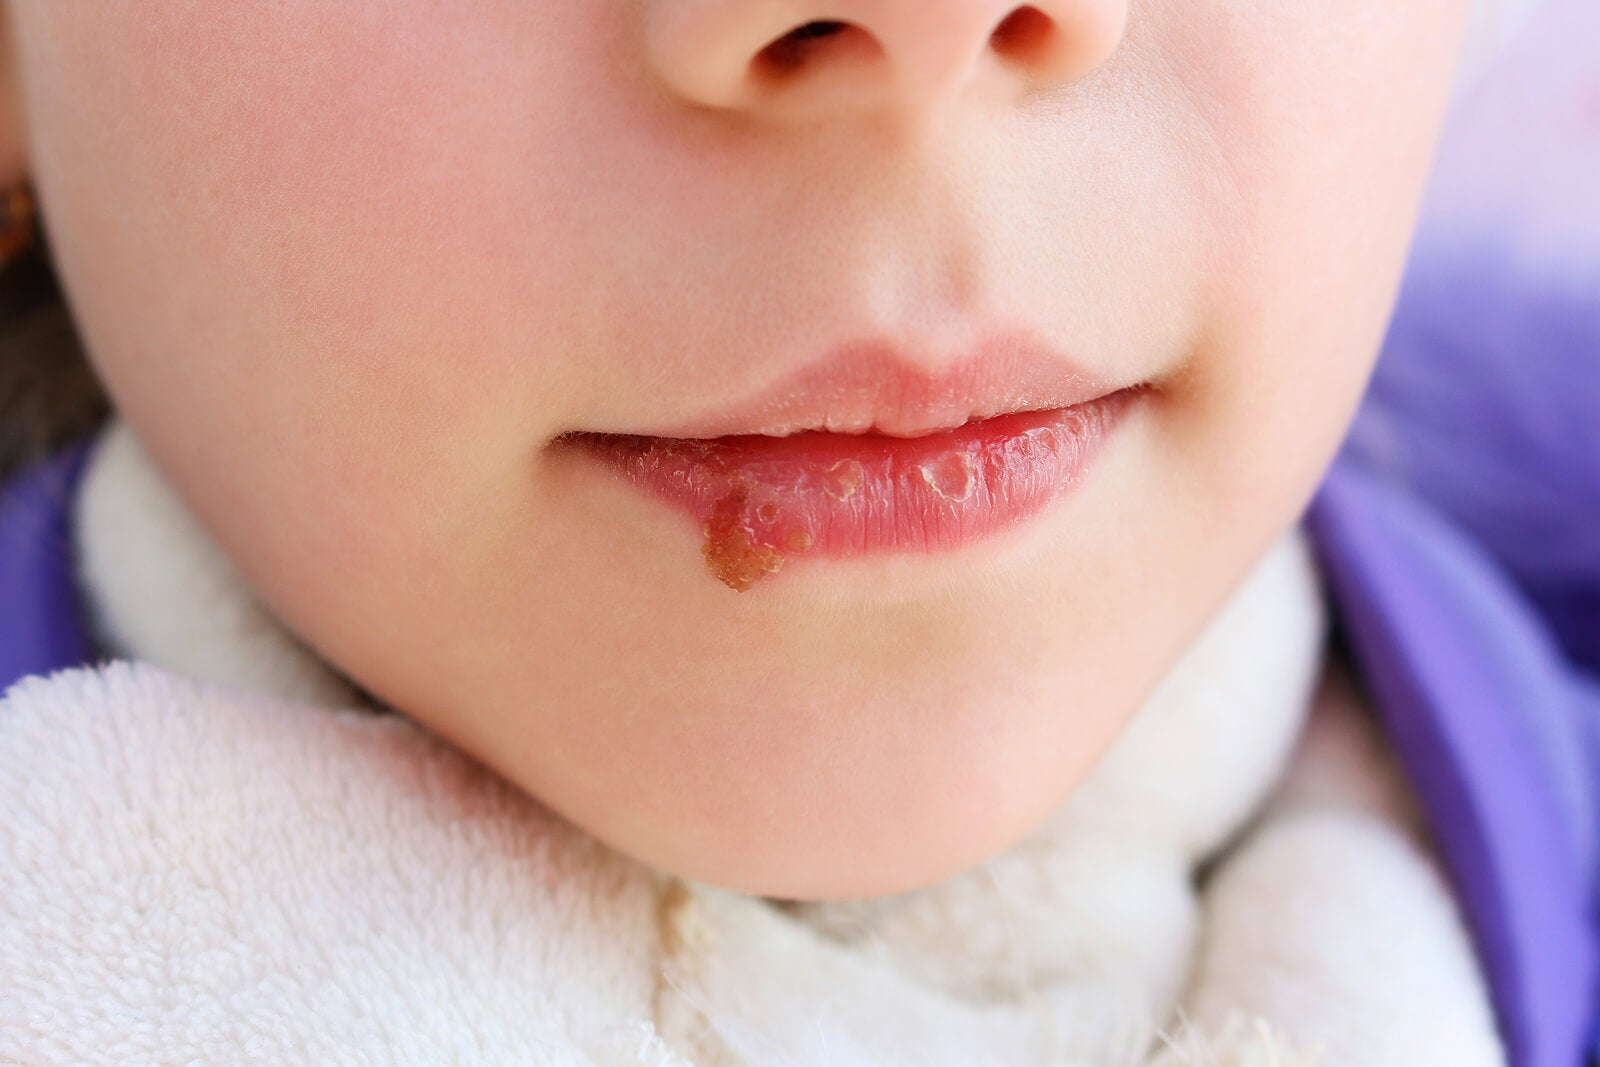 Niño con candidiasis oral.